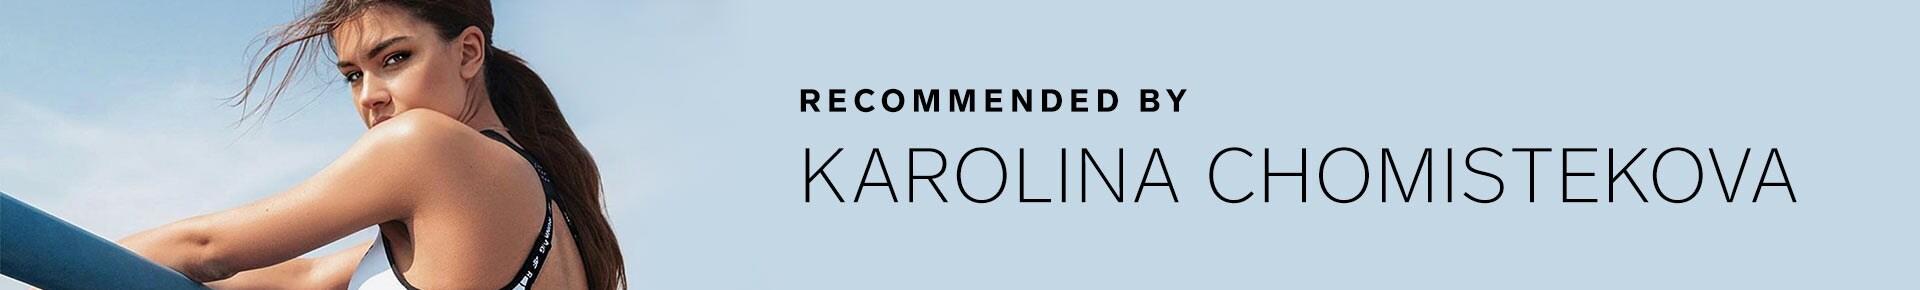 Recommended by KAROLINA CHOMISTEKOVA